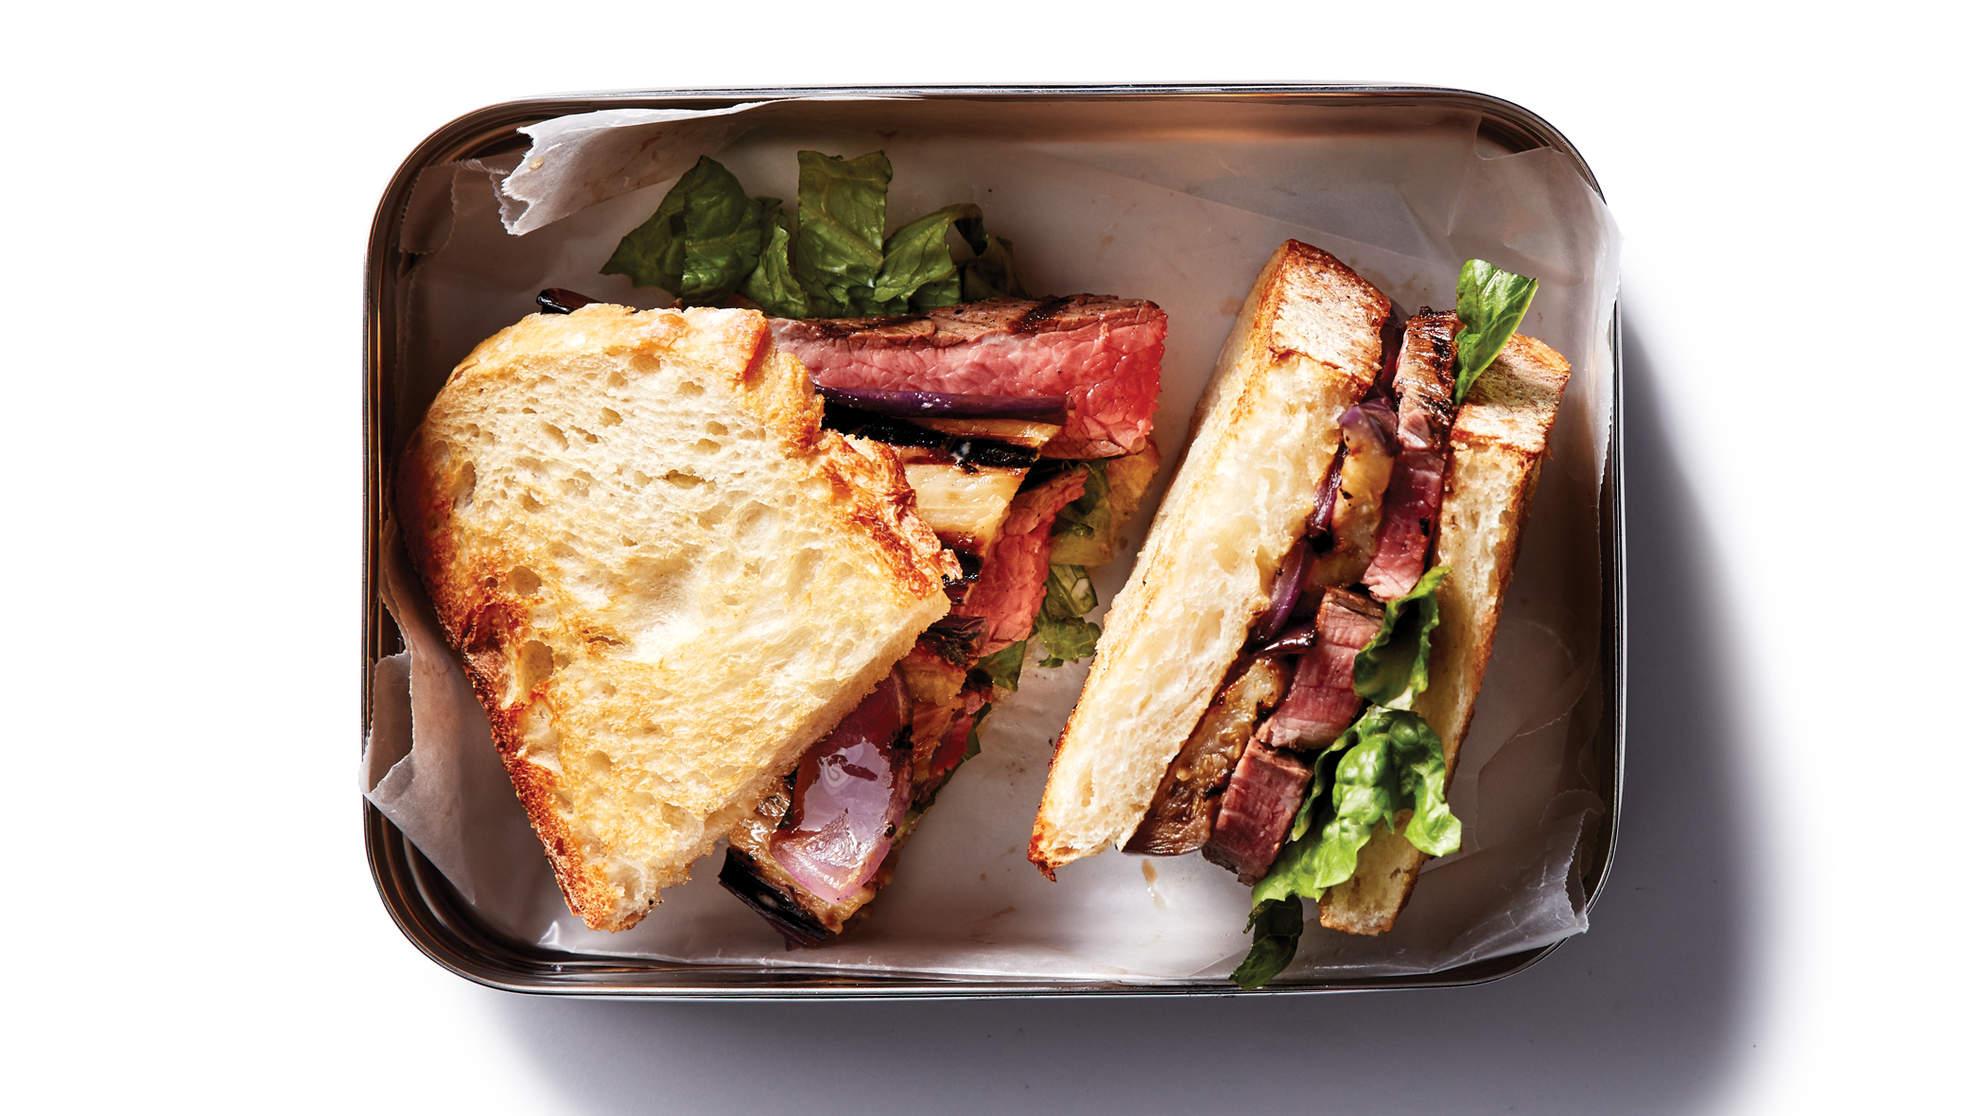 Sourdough Steak Sandwich